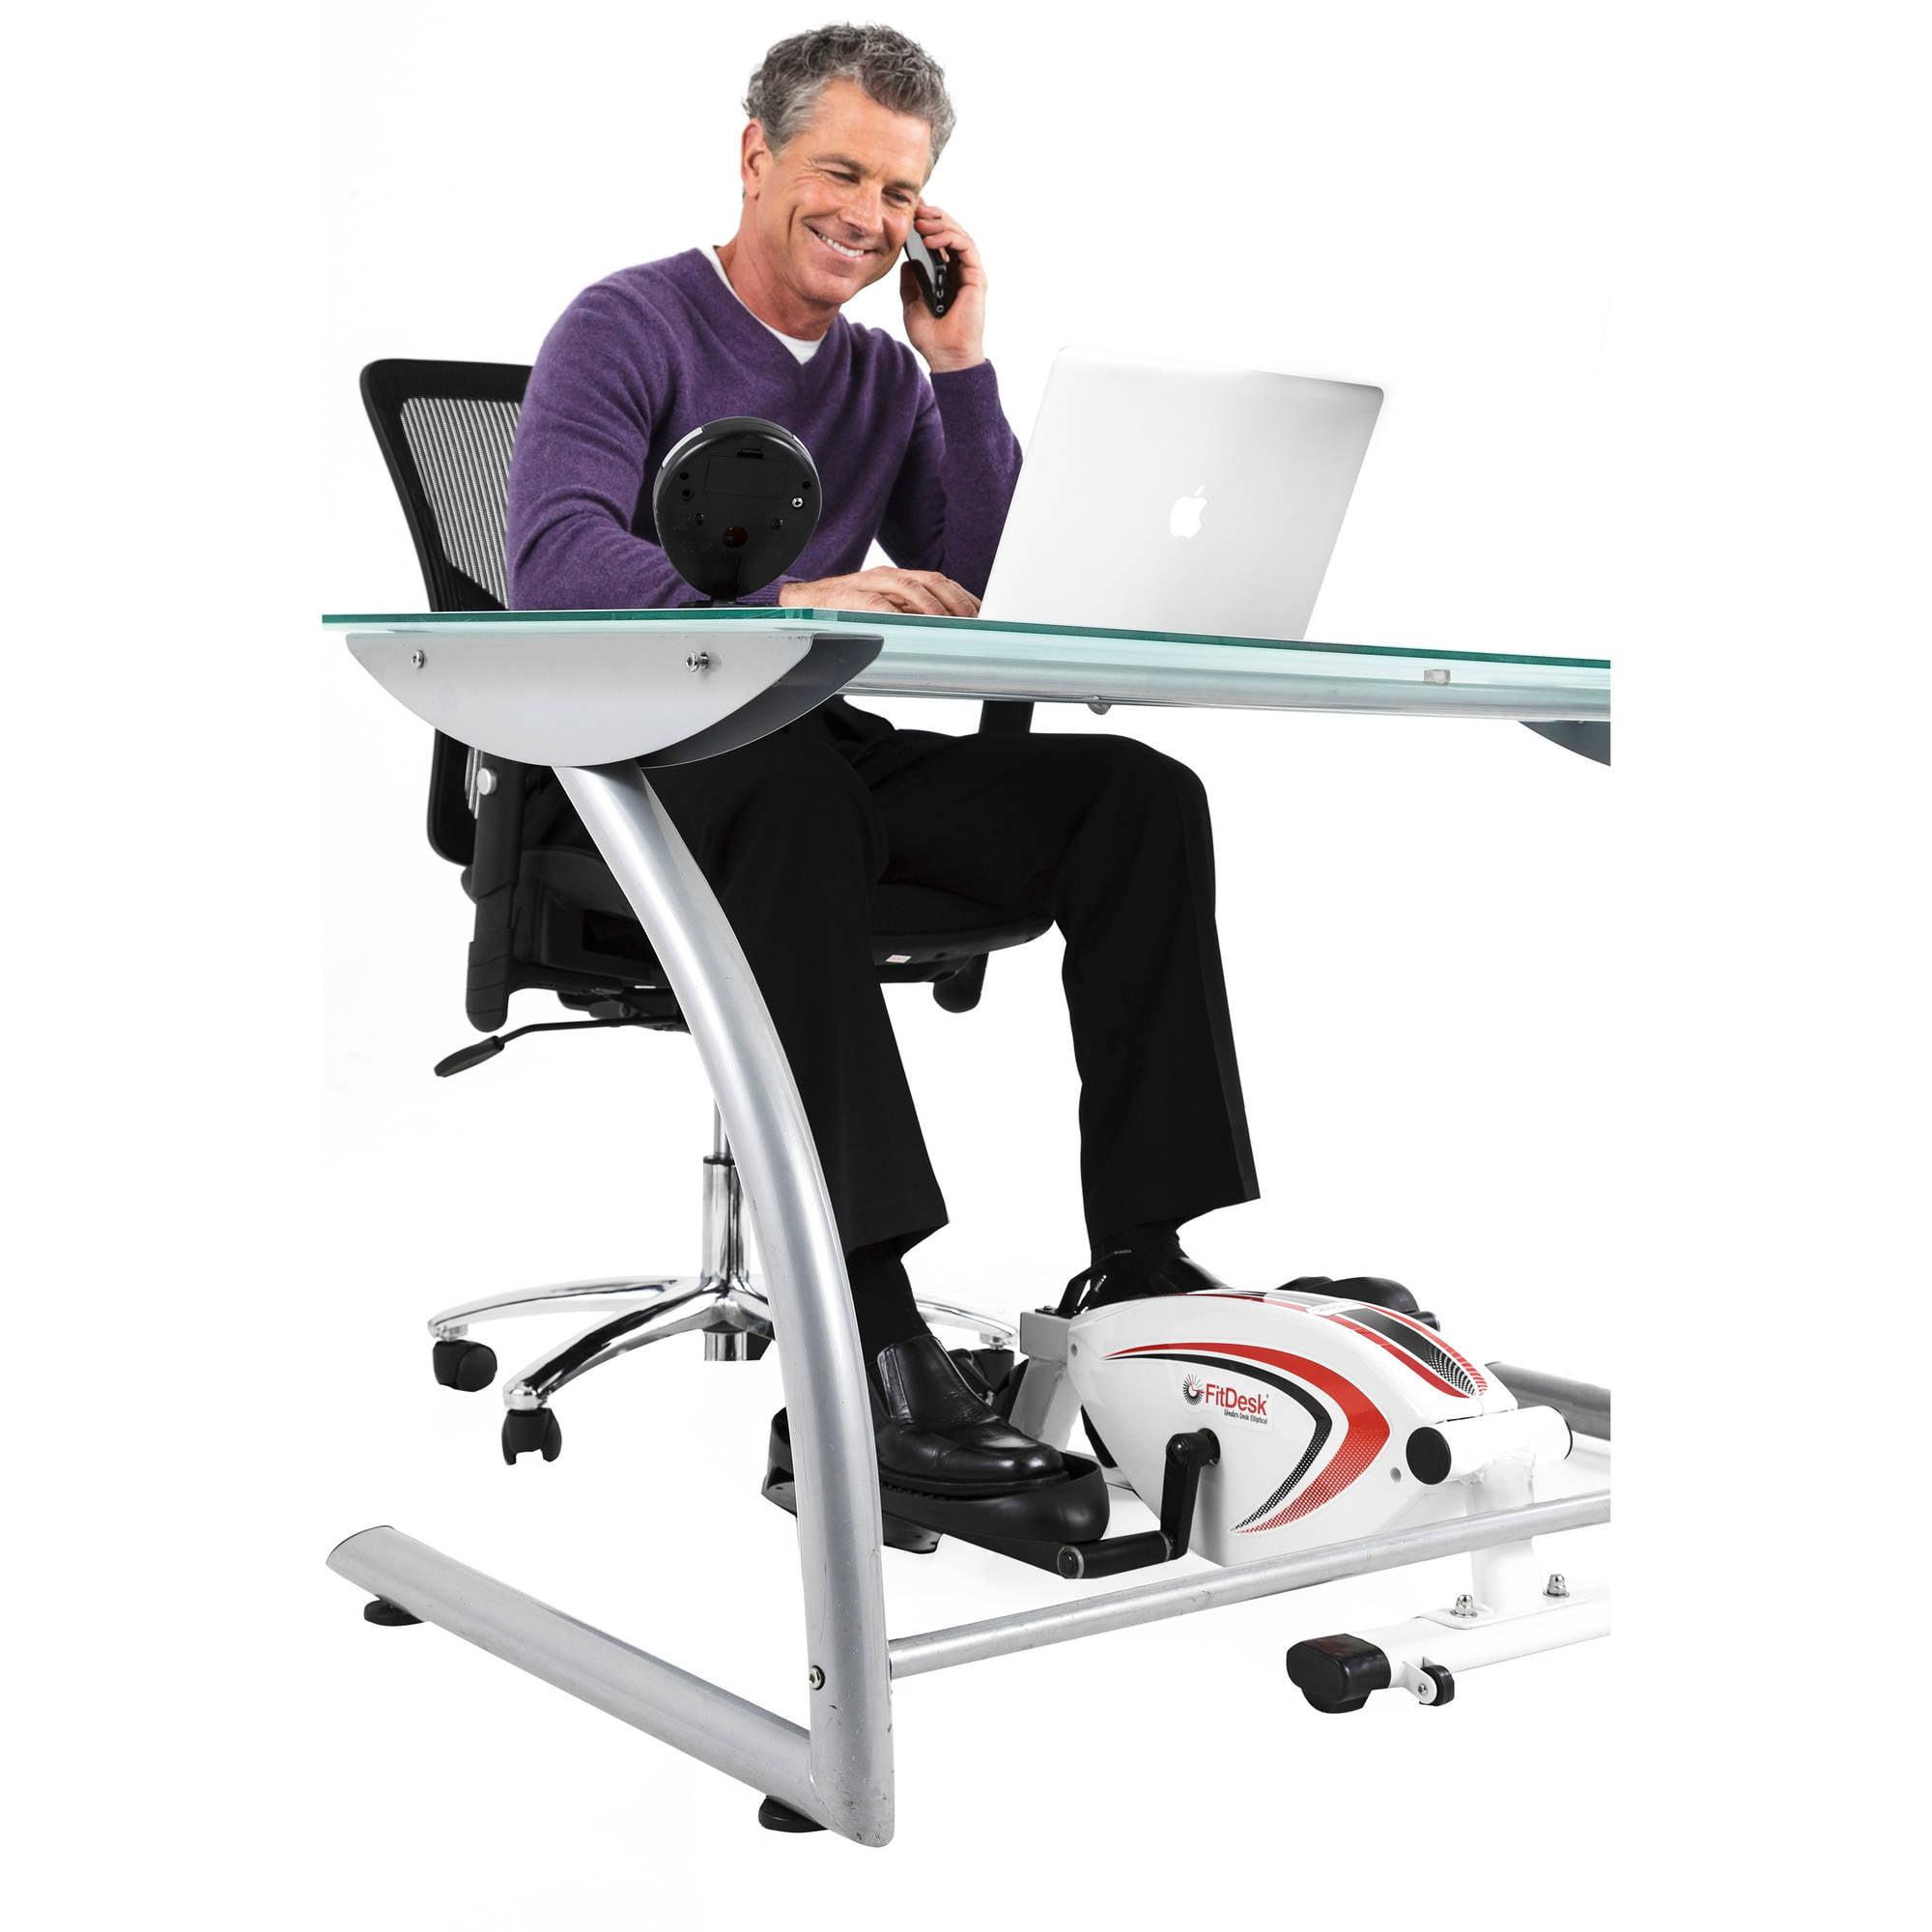 sunny best magnetic reviews fitness elliptical mini bike sf desk top the exercise under health